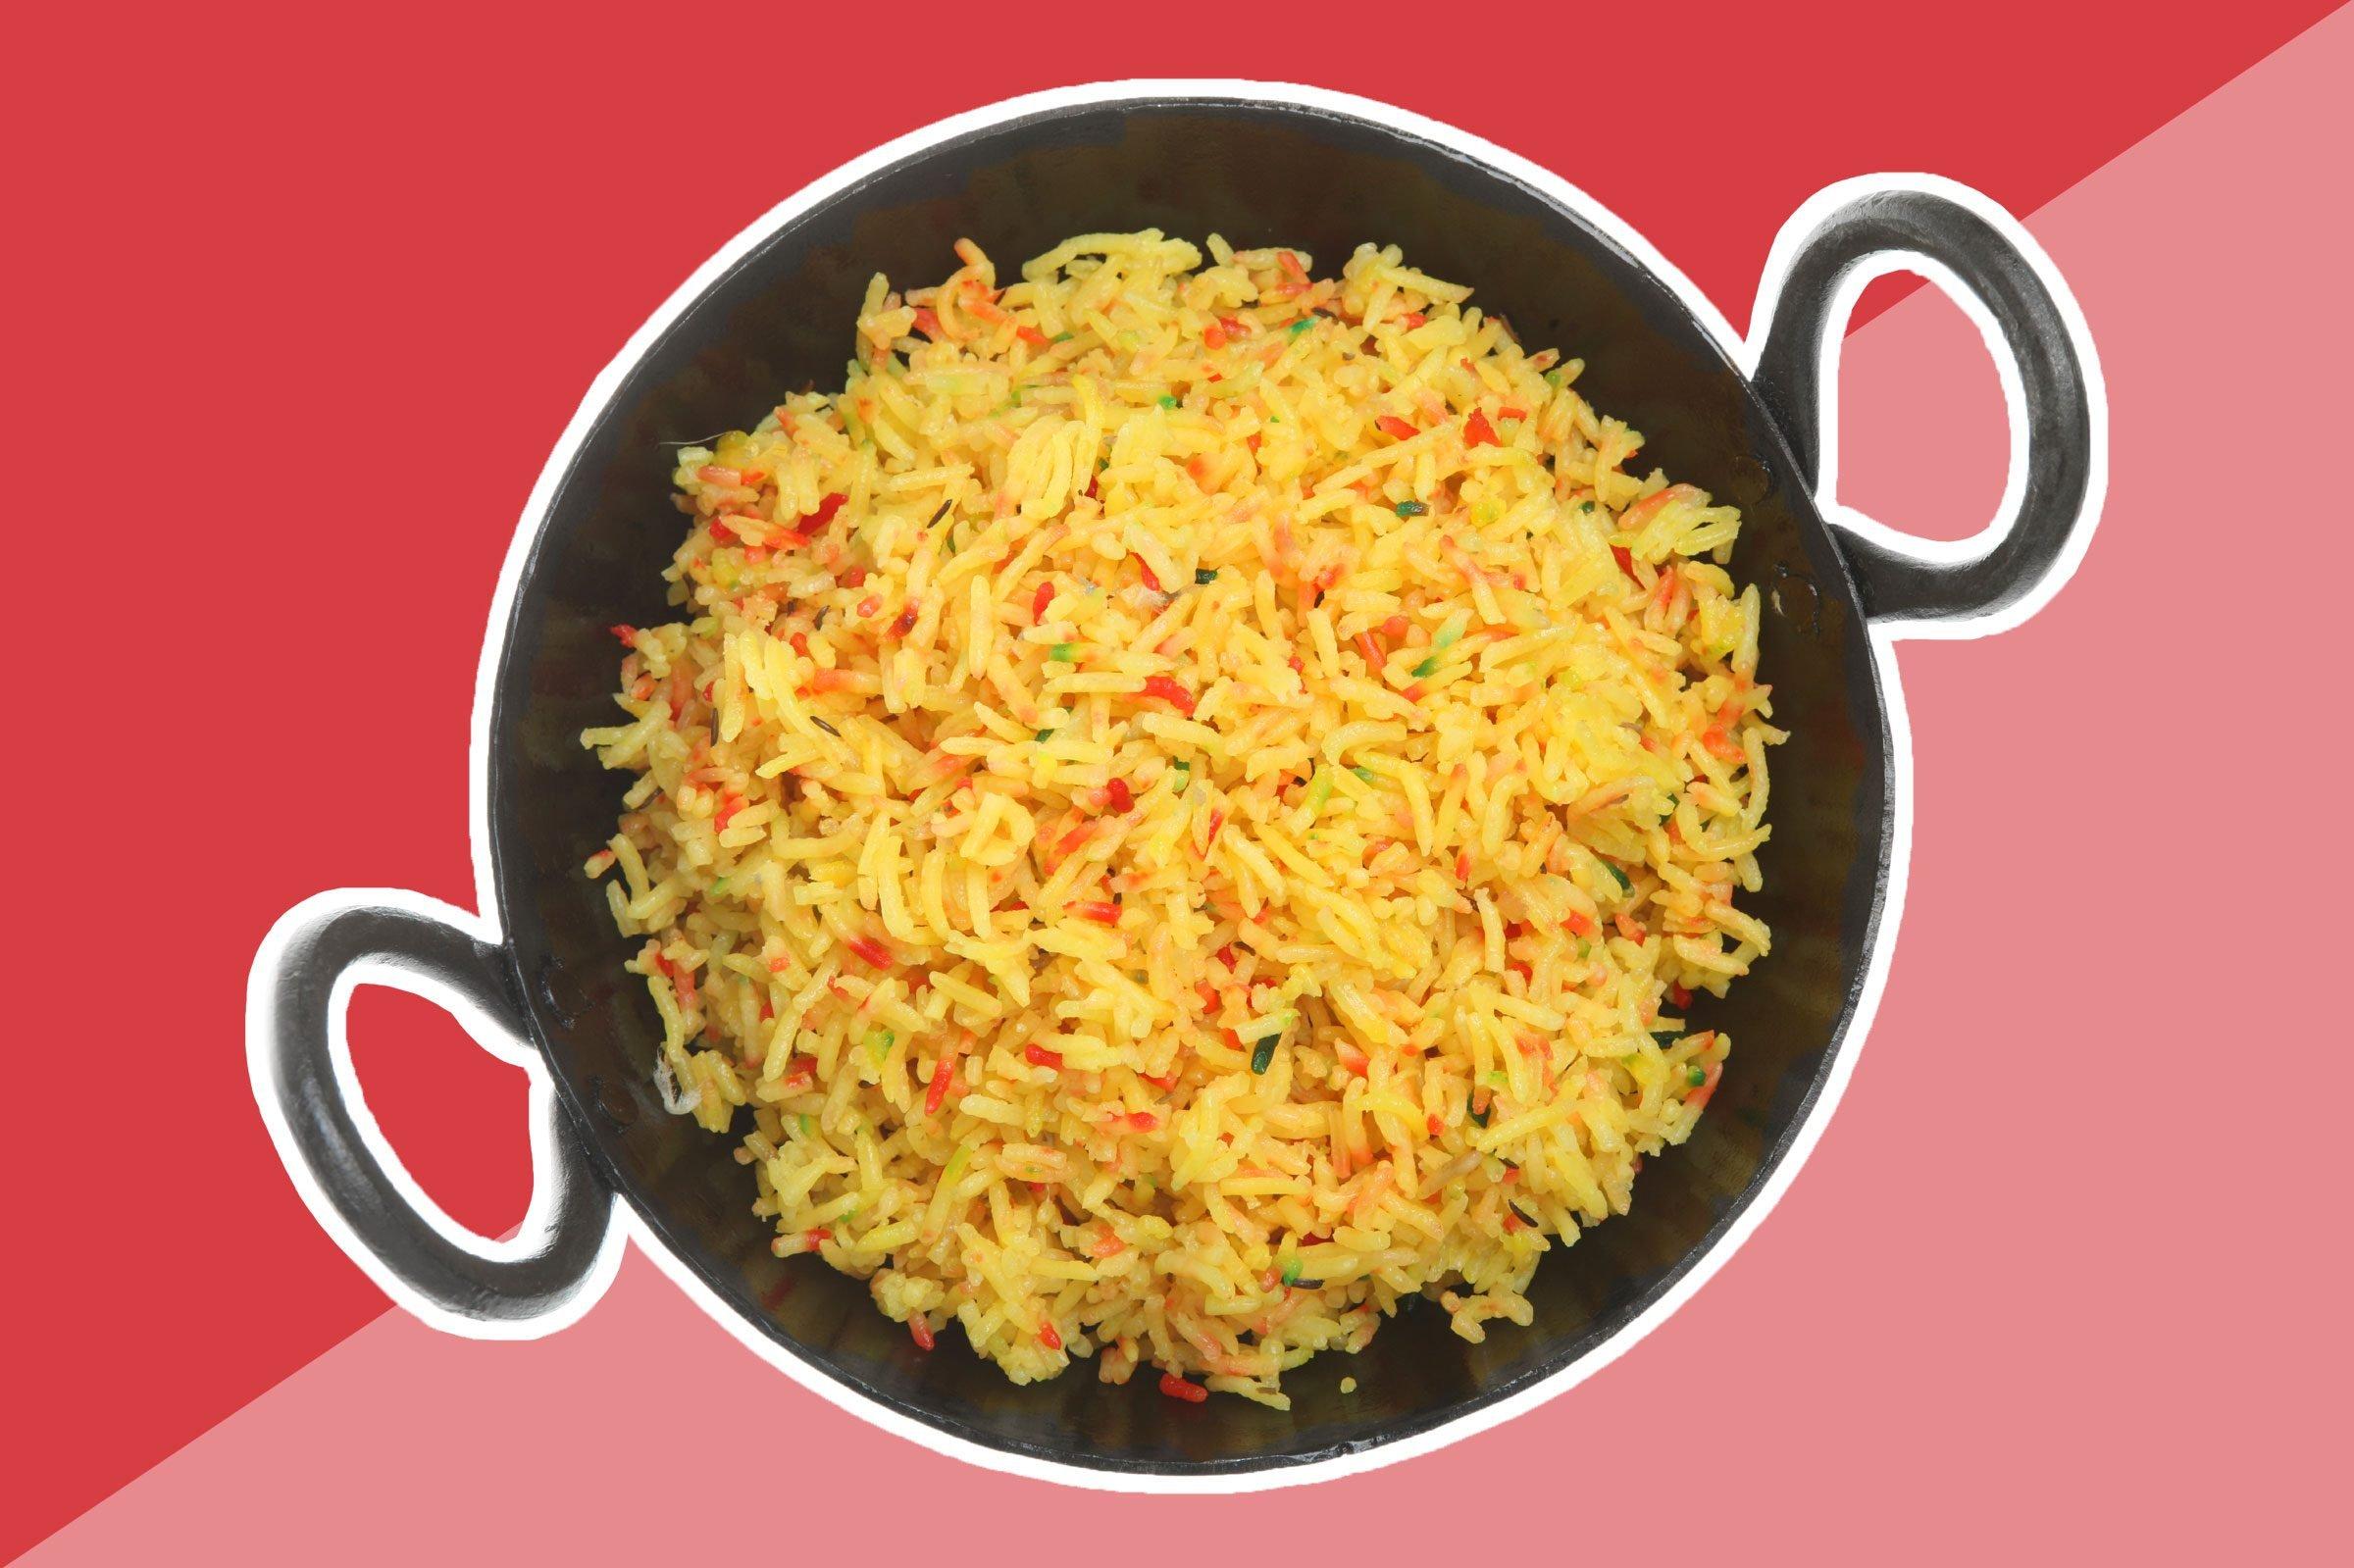 Boxed rice 'entree' or side-dish mixes